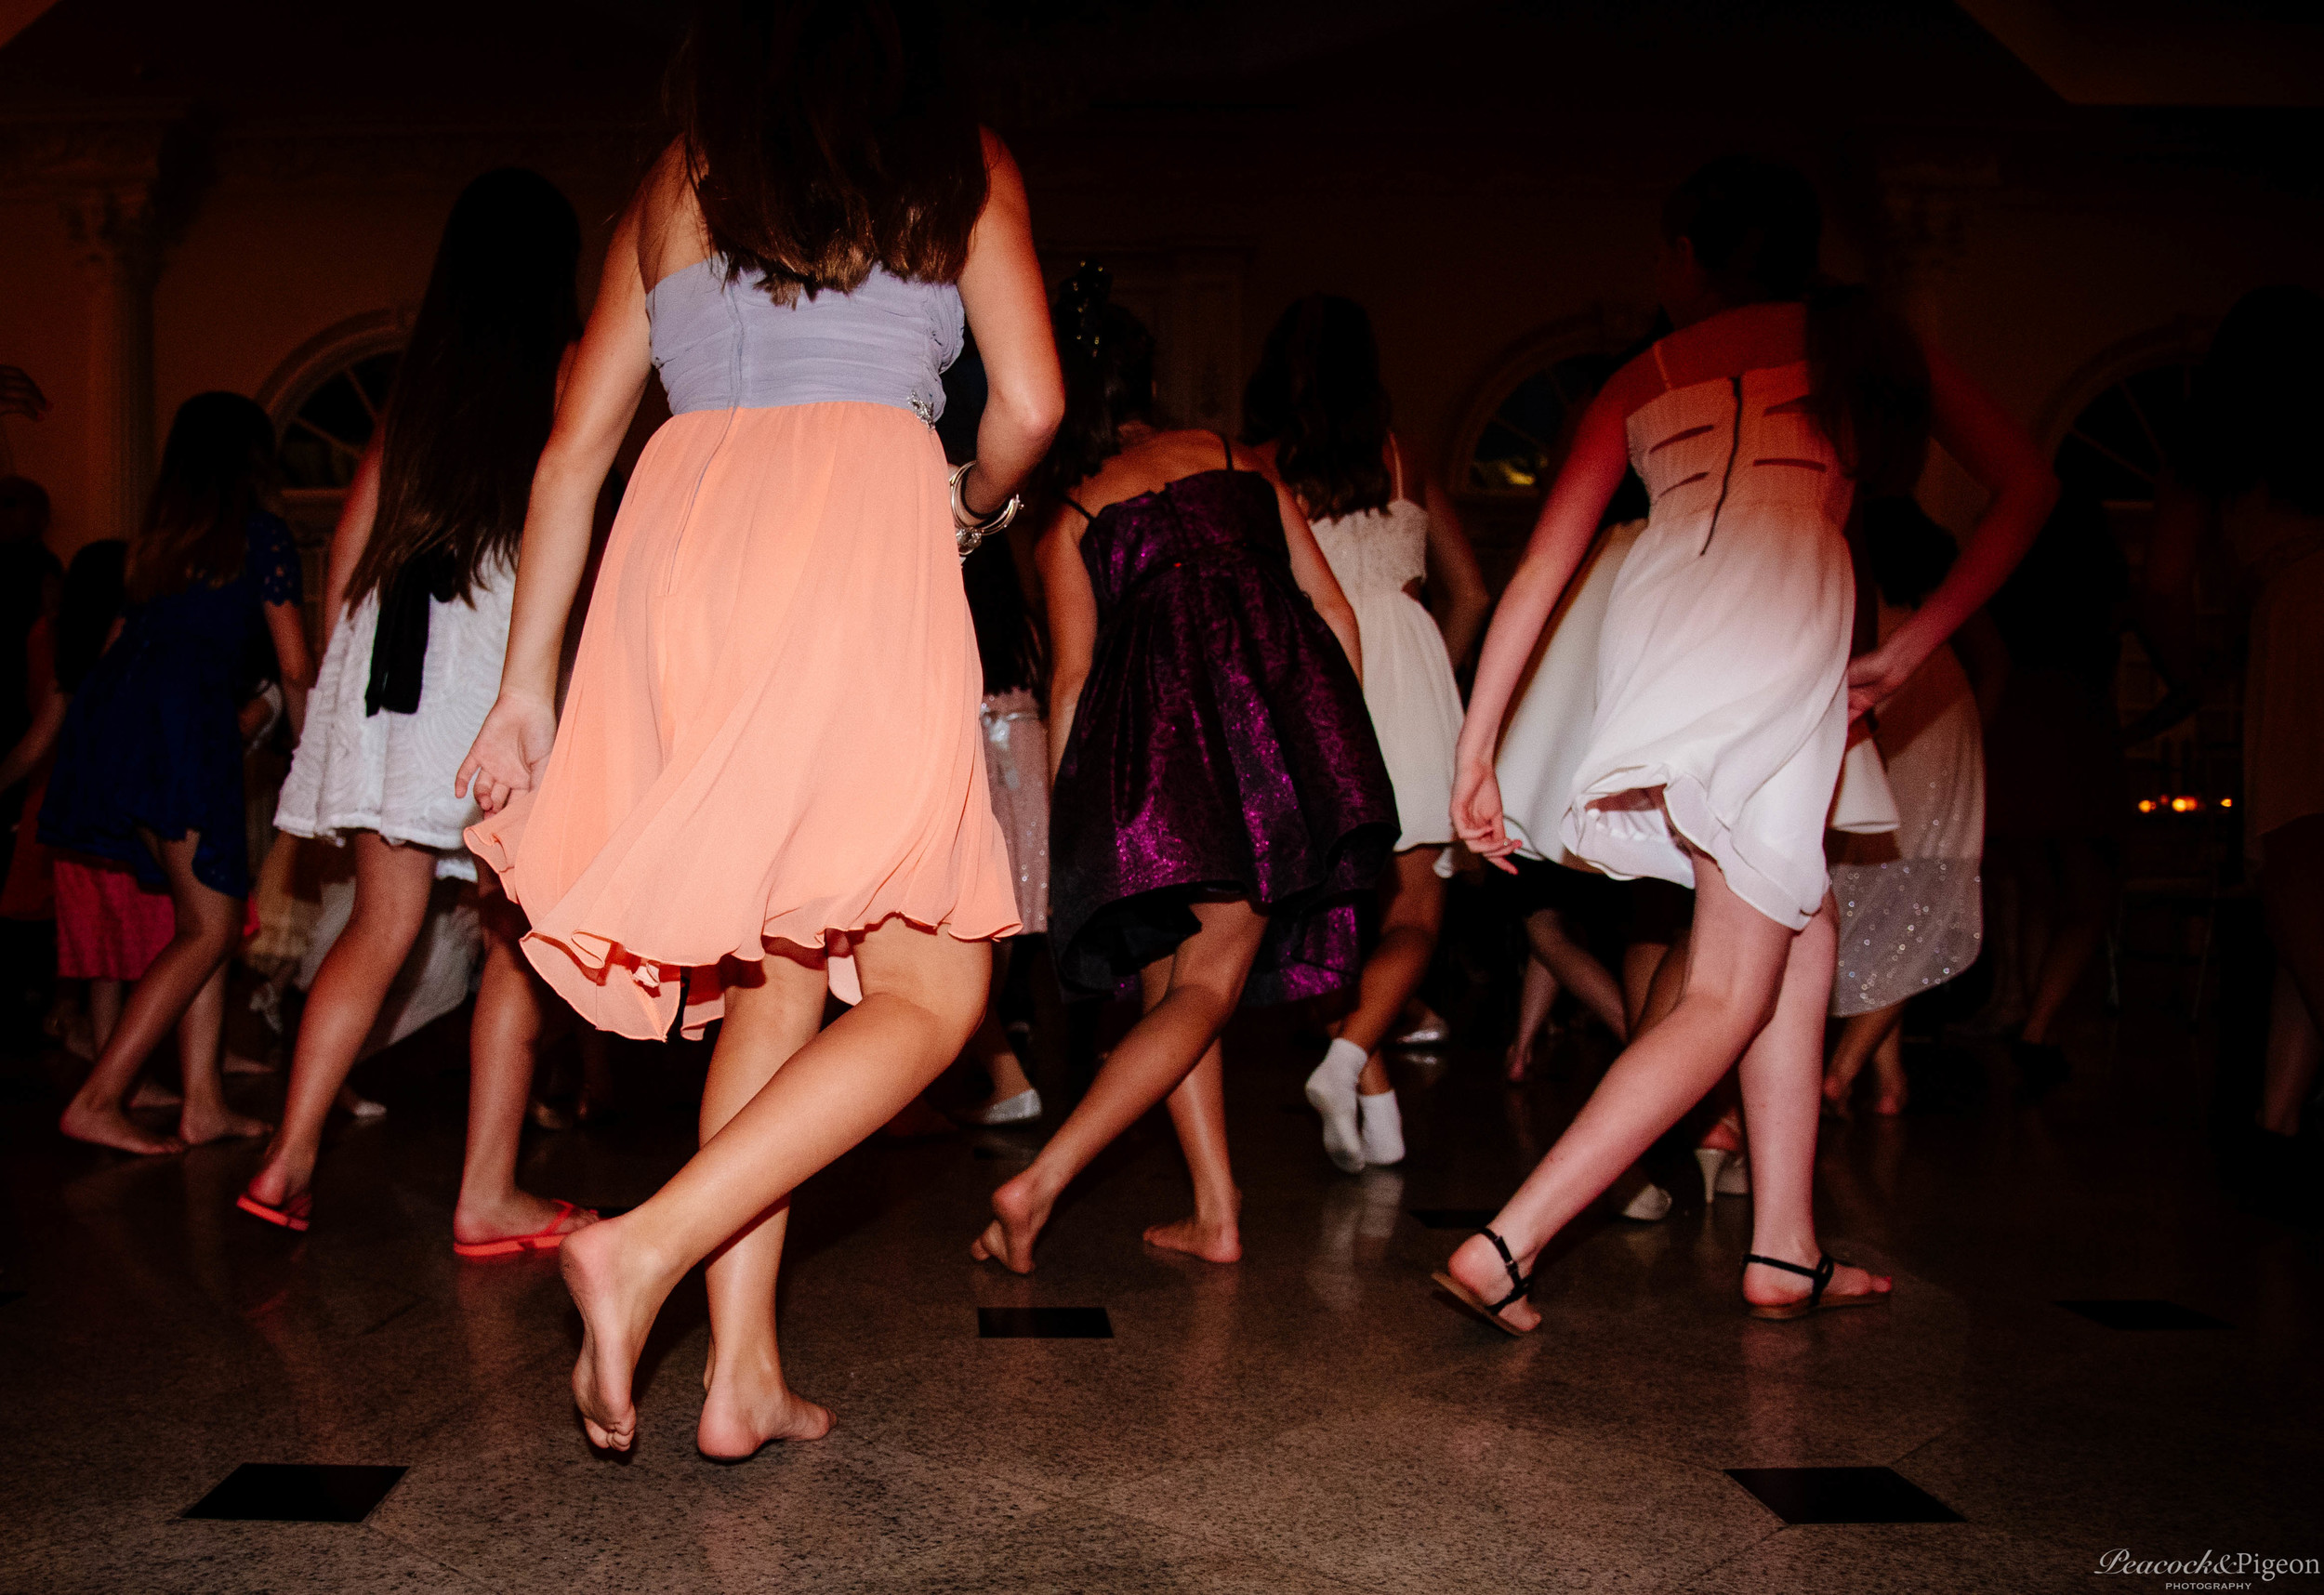 Next_Level_All_Star_Dance_School_Part2C-W-117-228.jpg